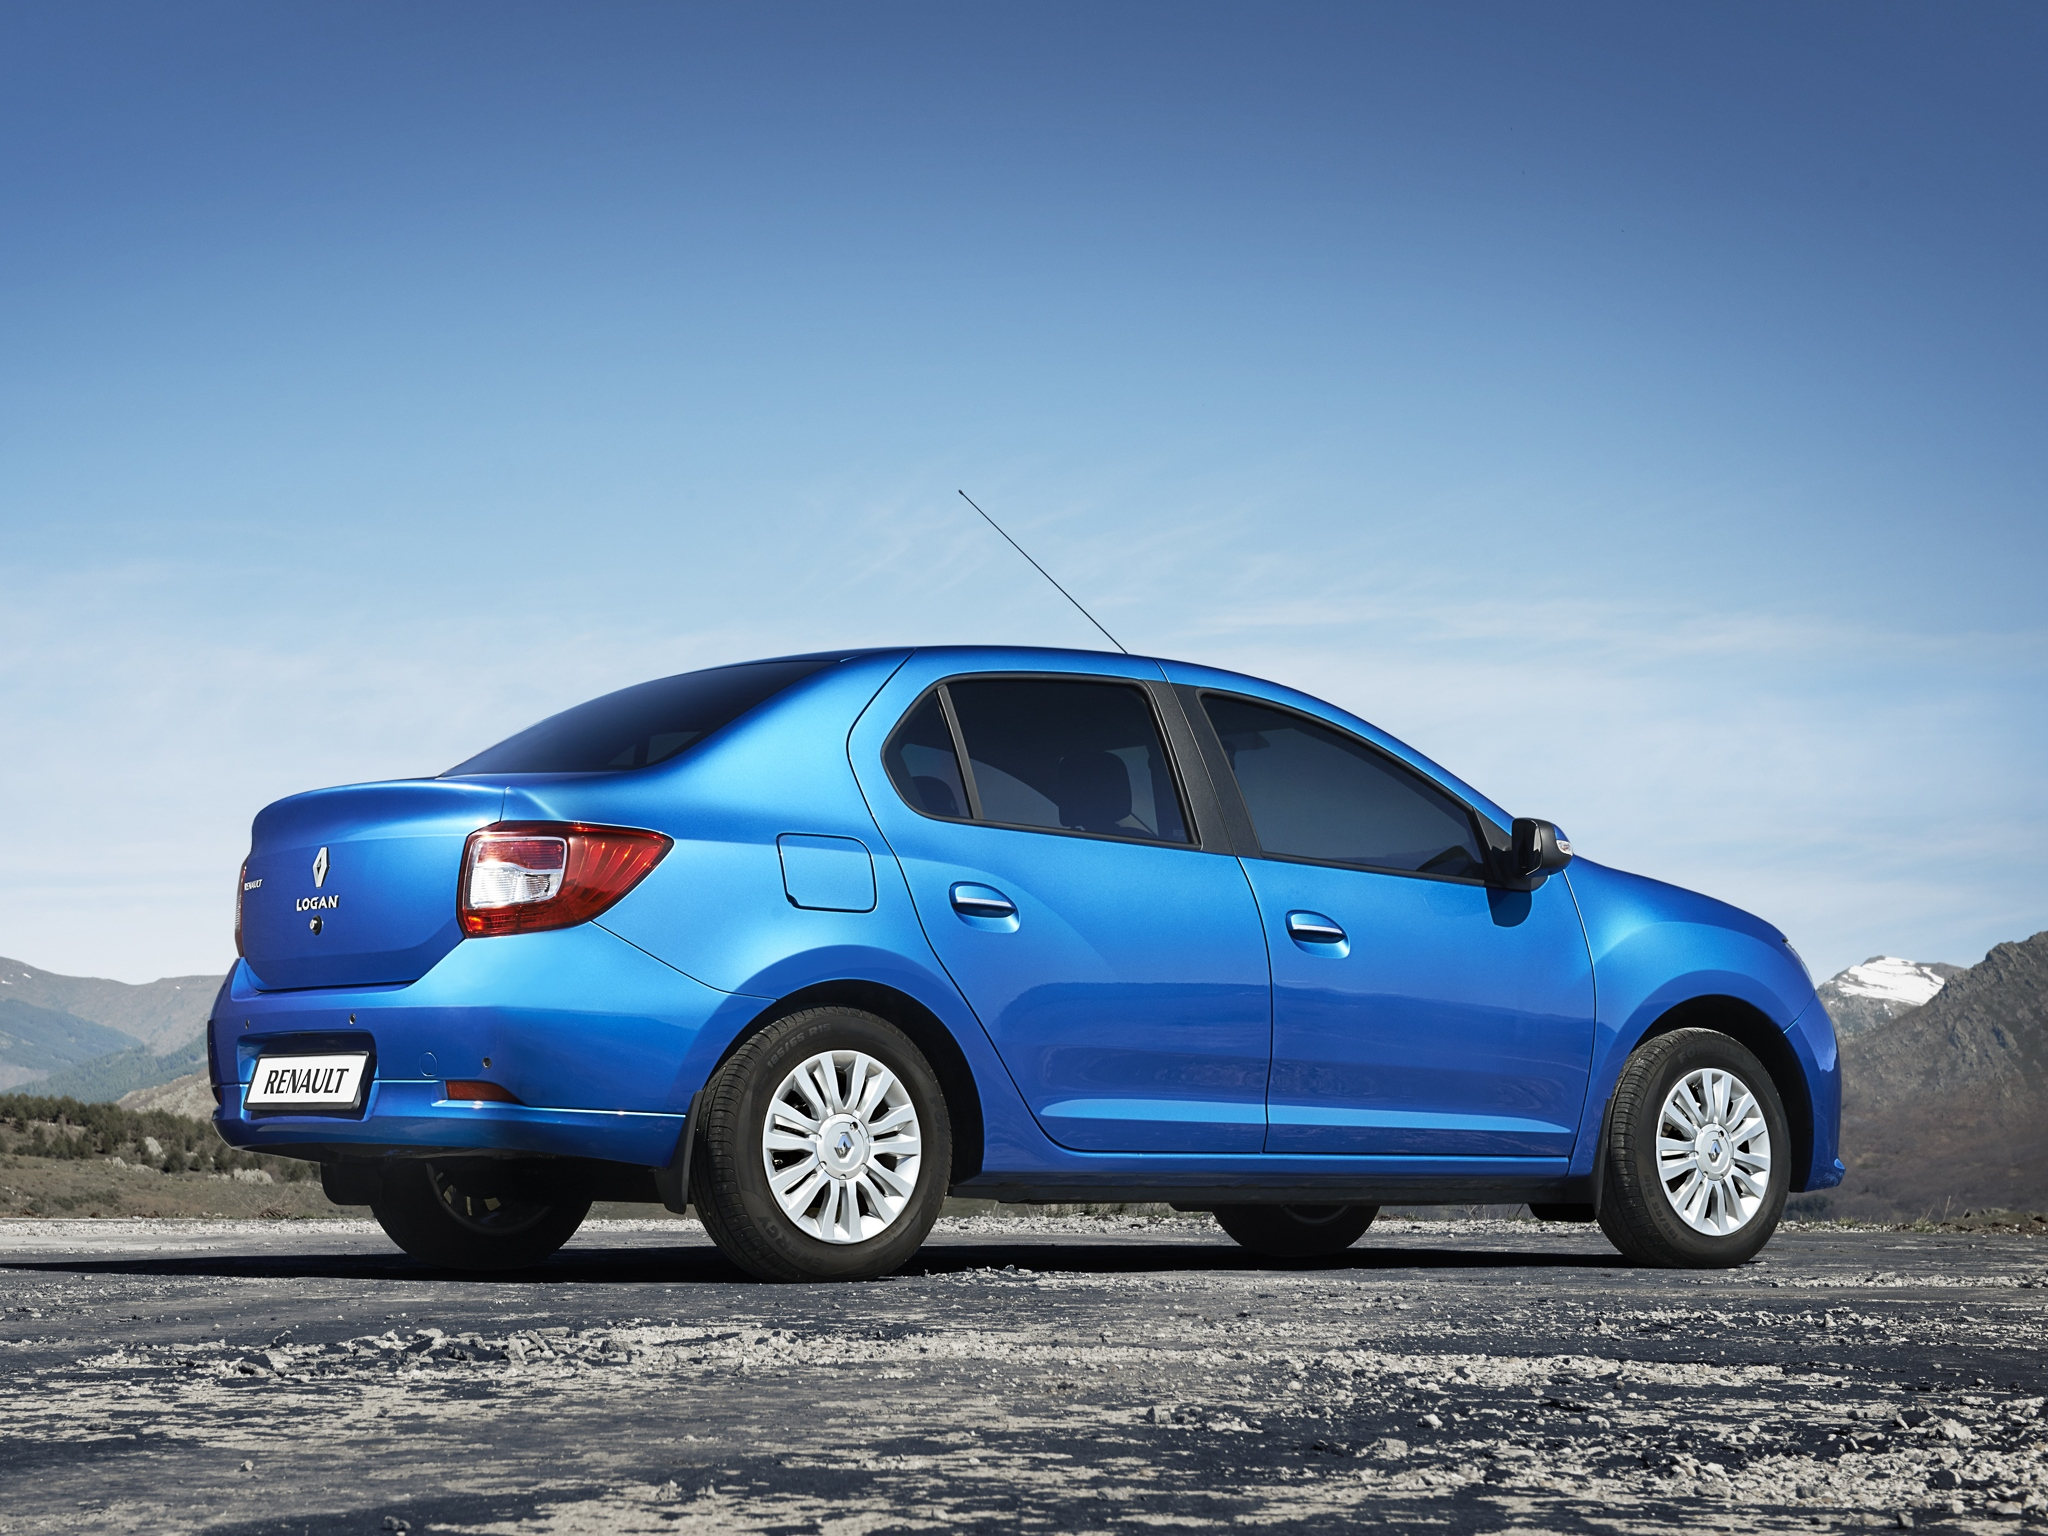 Renault Launches New Logan Sedan in Russia: Full Details ...